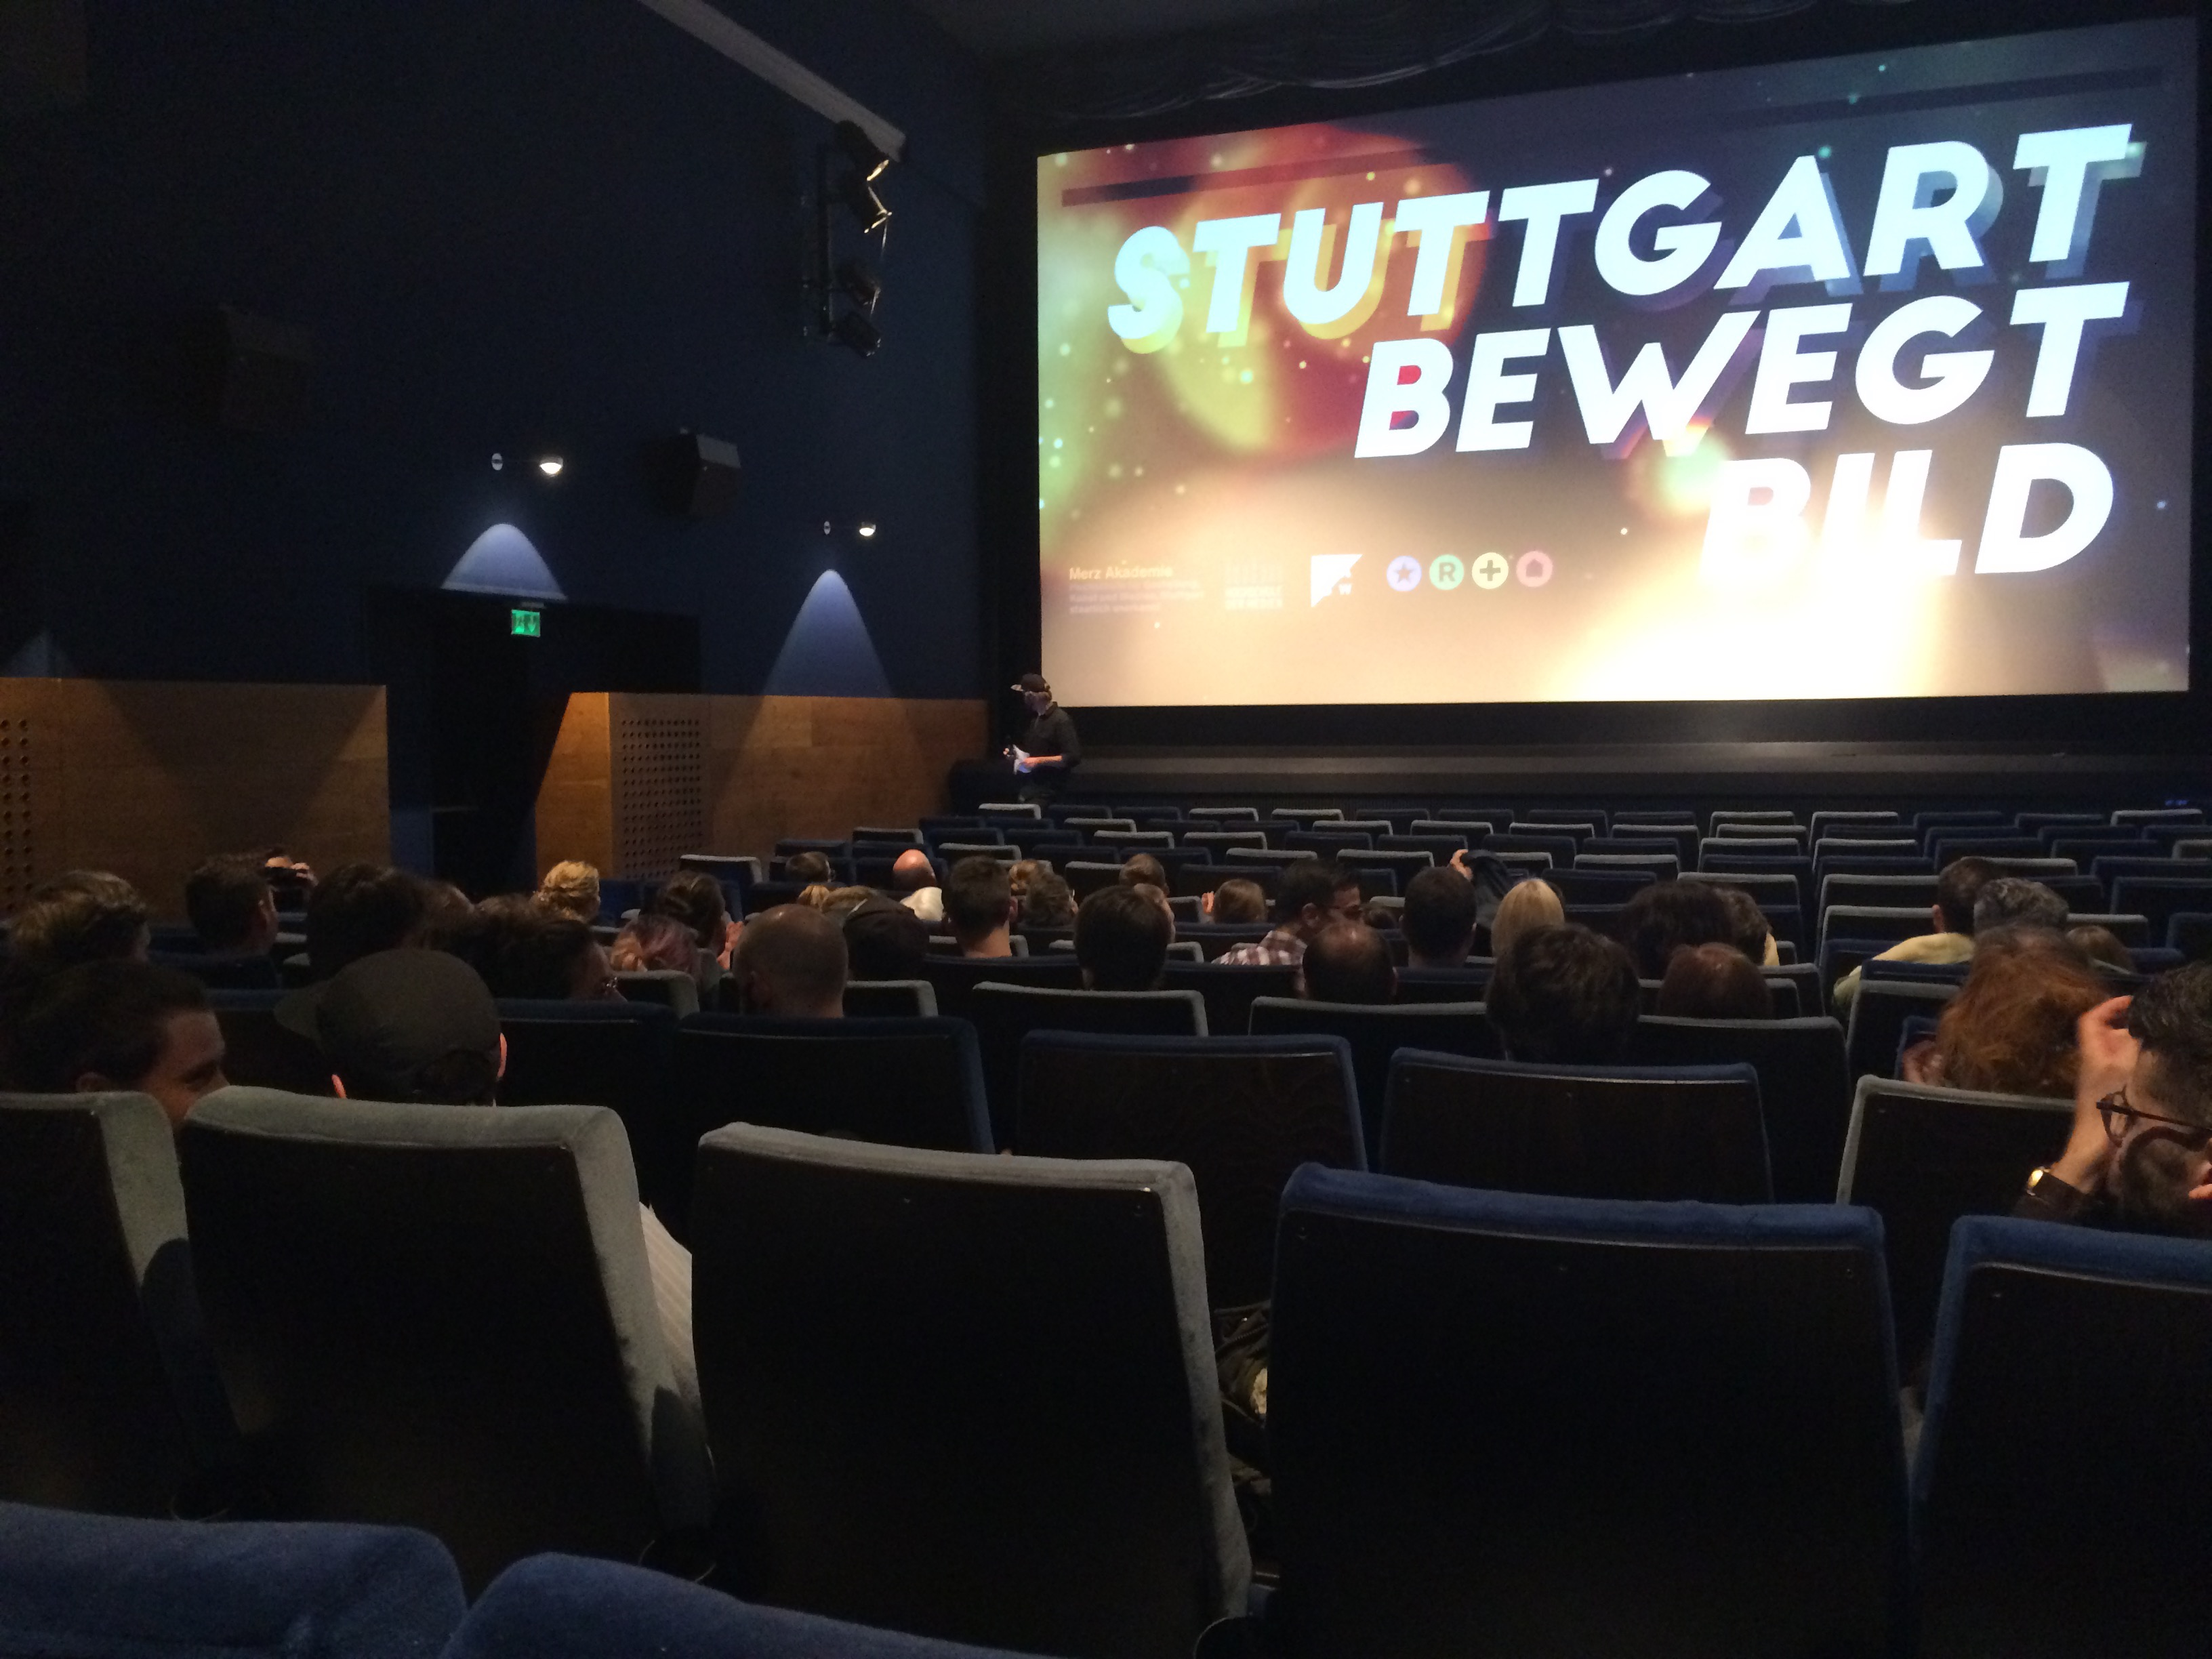 Stuttgart Bewegt Film 2018